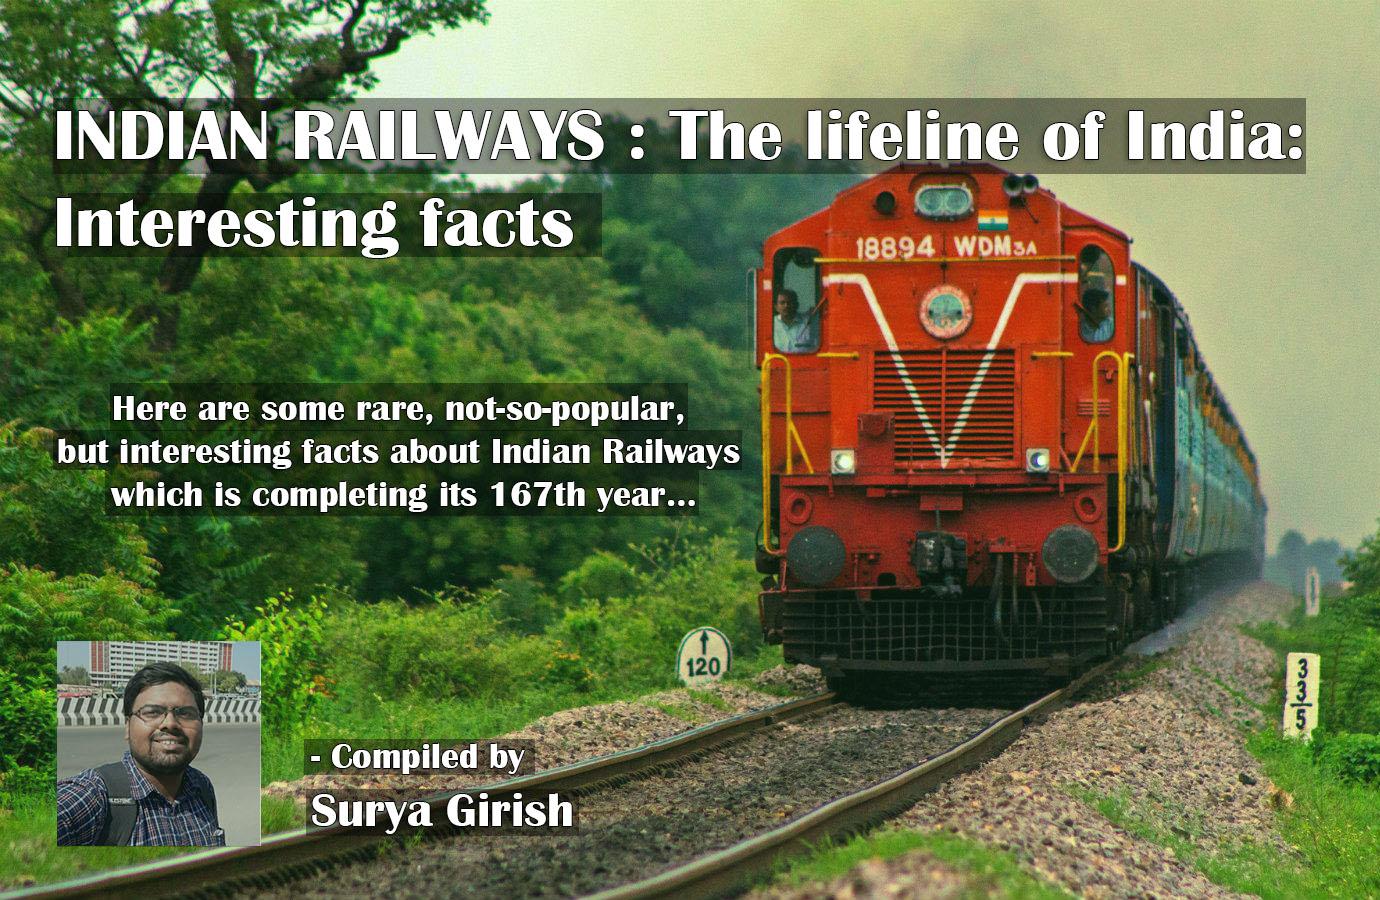 RARE FACTS ON INDIAN RAILWAYS